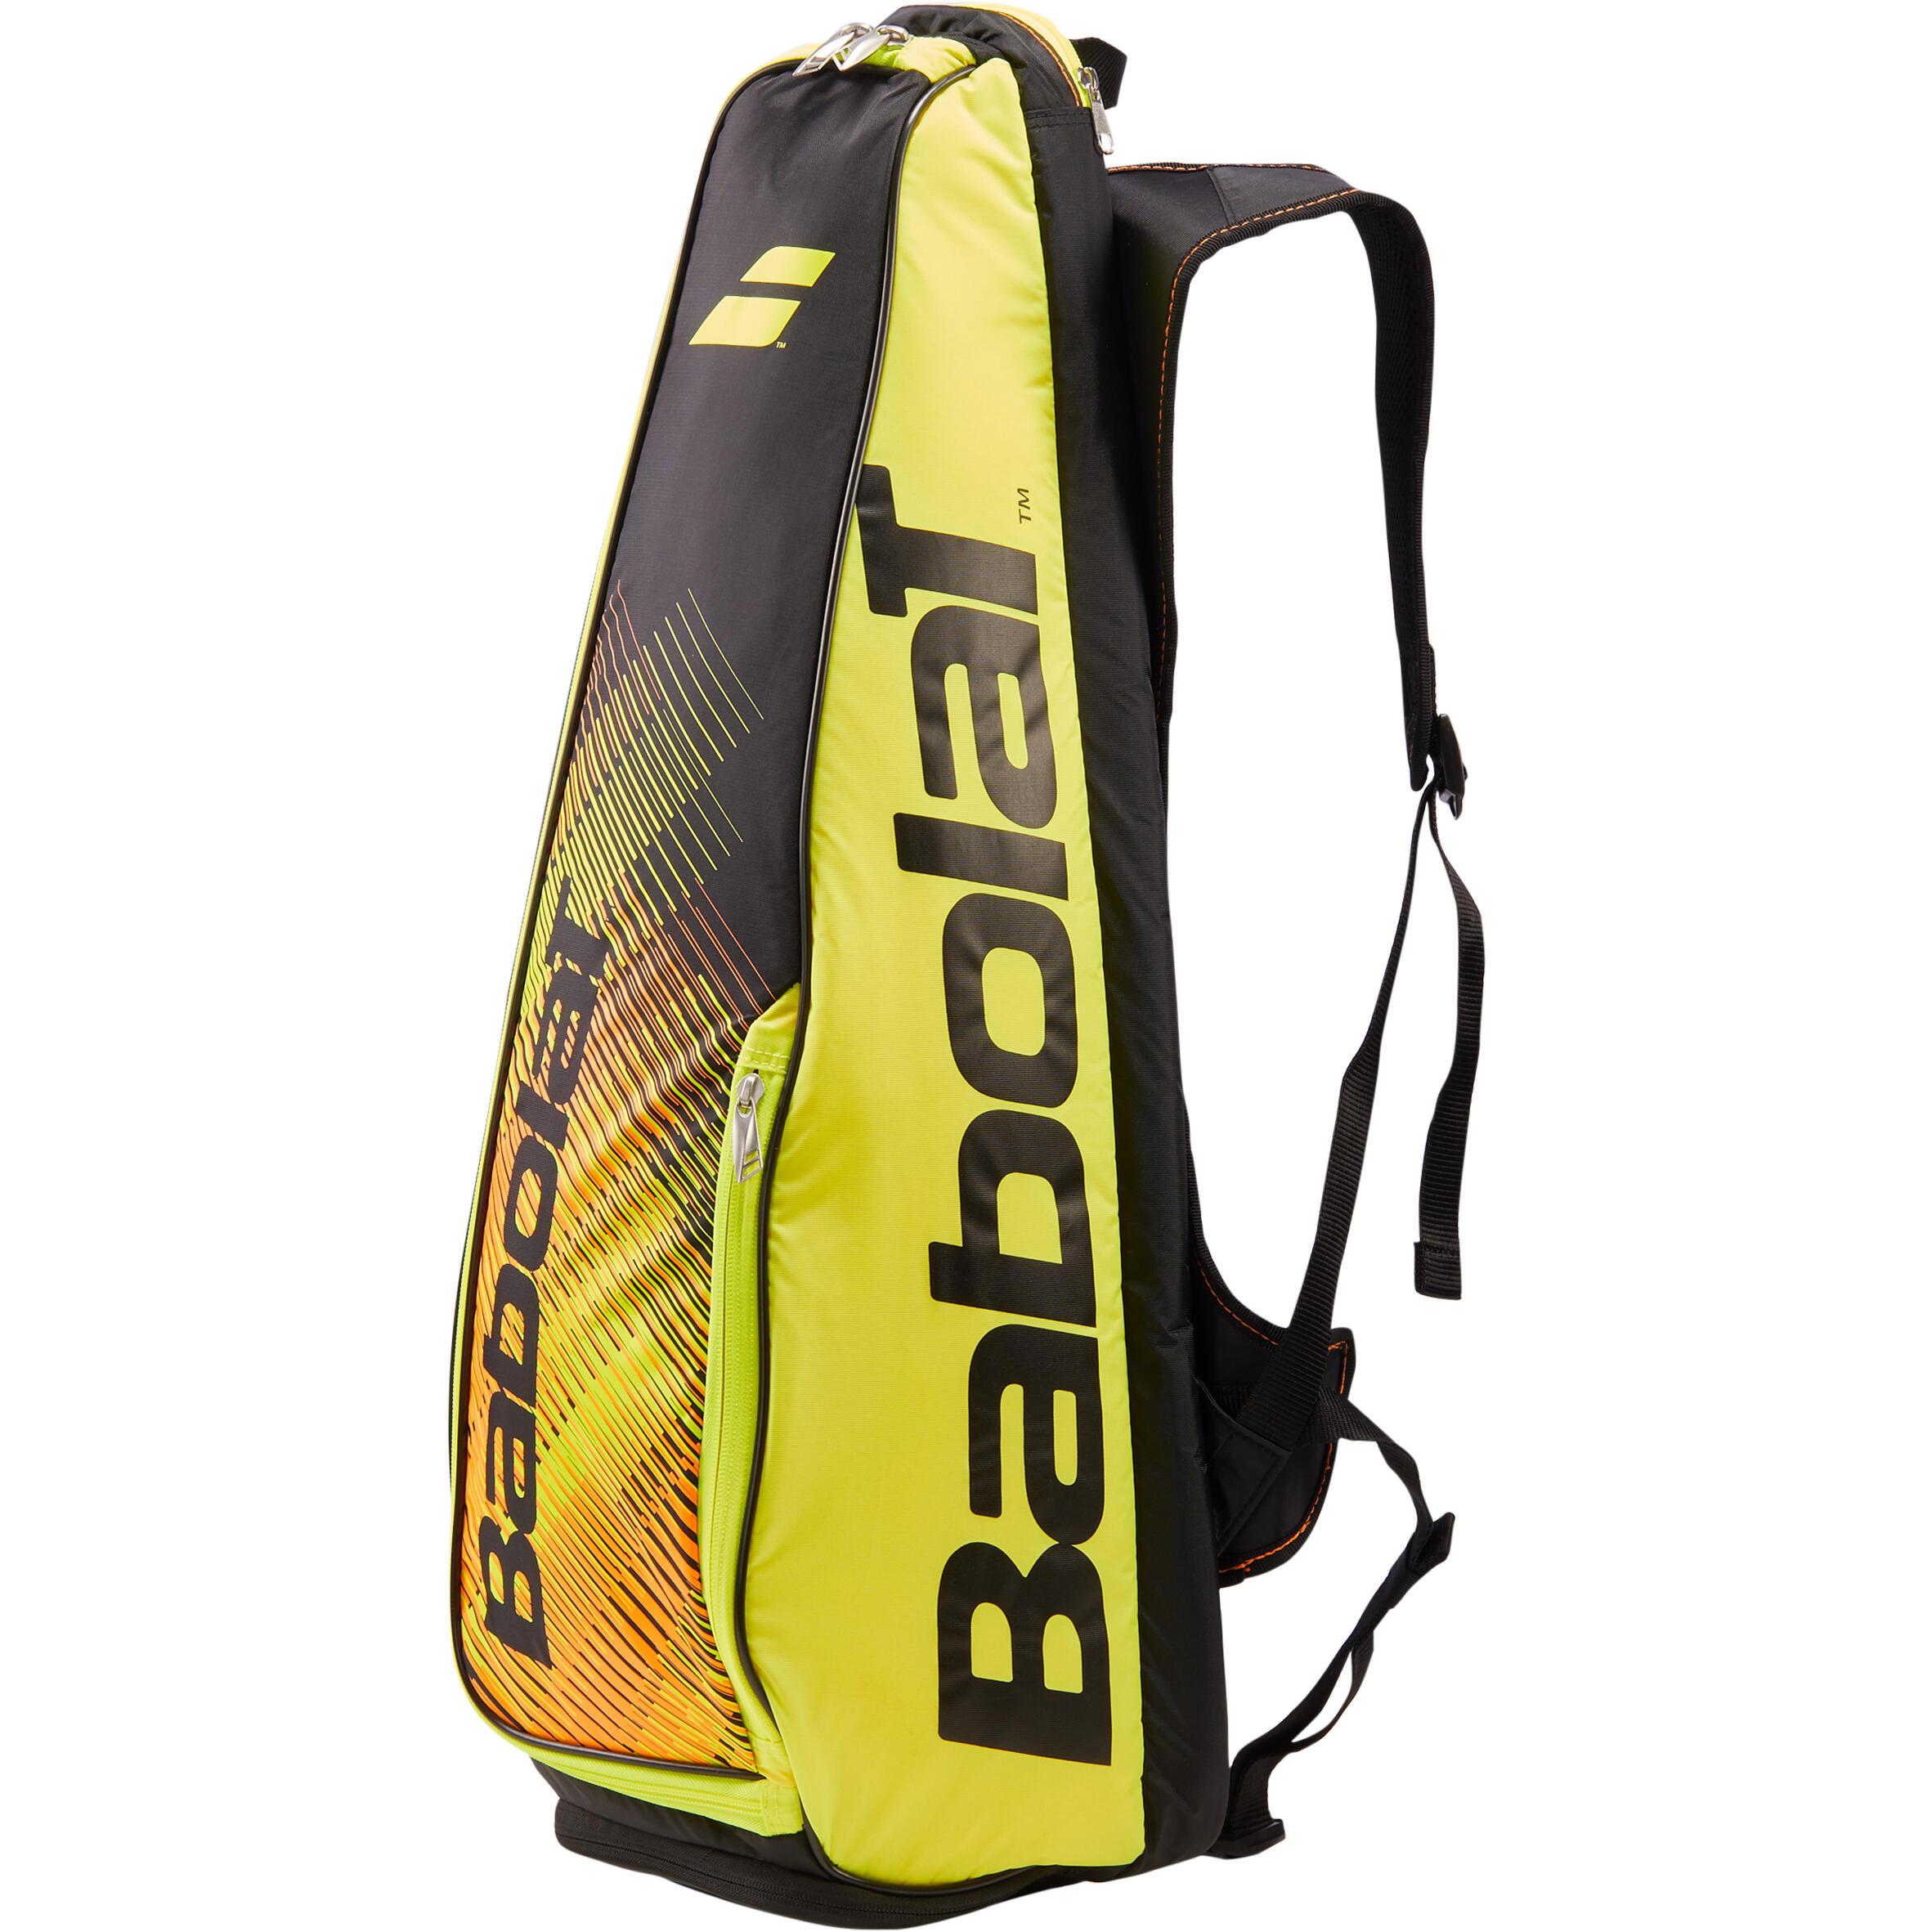 434ab8478b1 Babolat Sporttas racketsporten Babolat zwart fluogeel 2R | Decathlon.nl